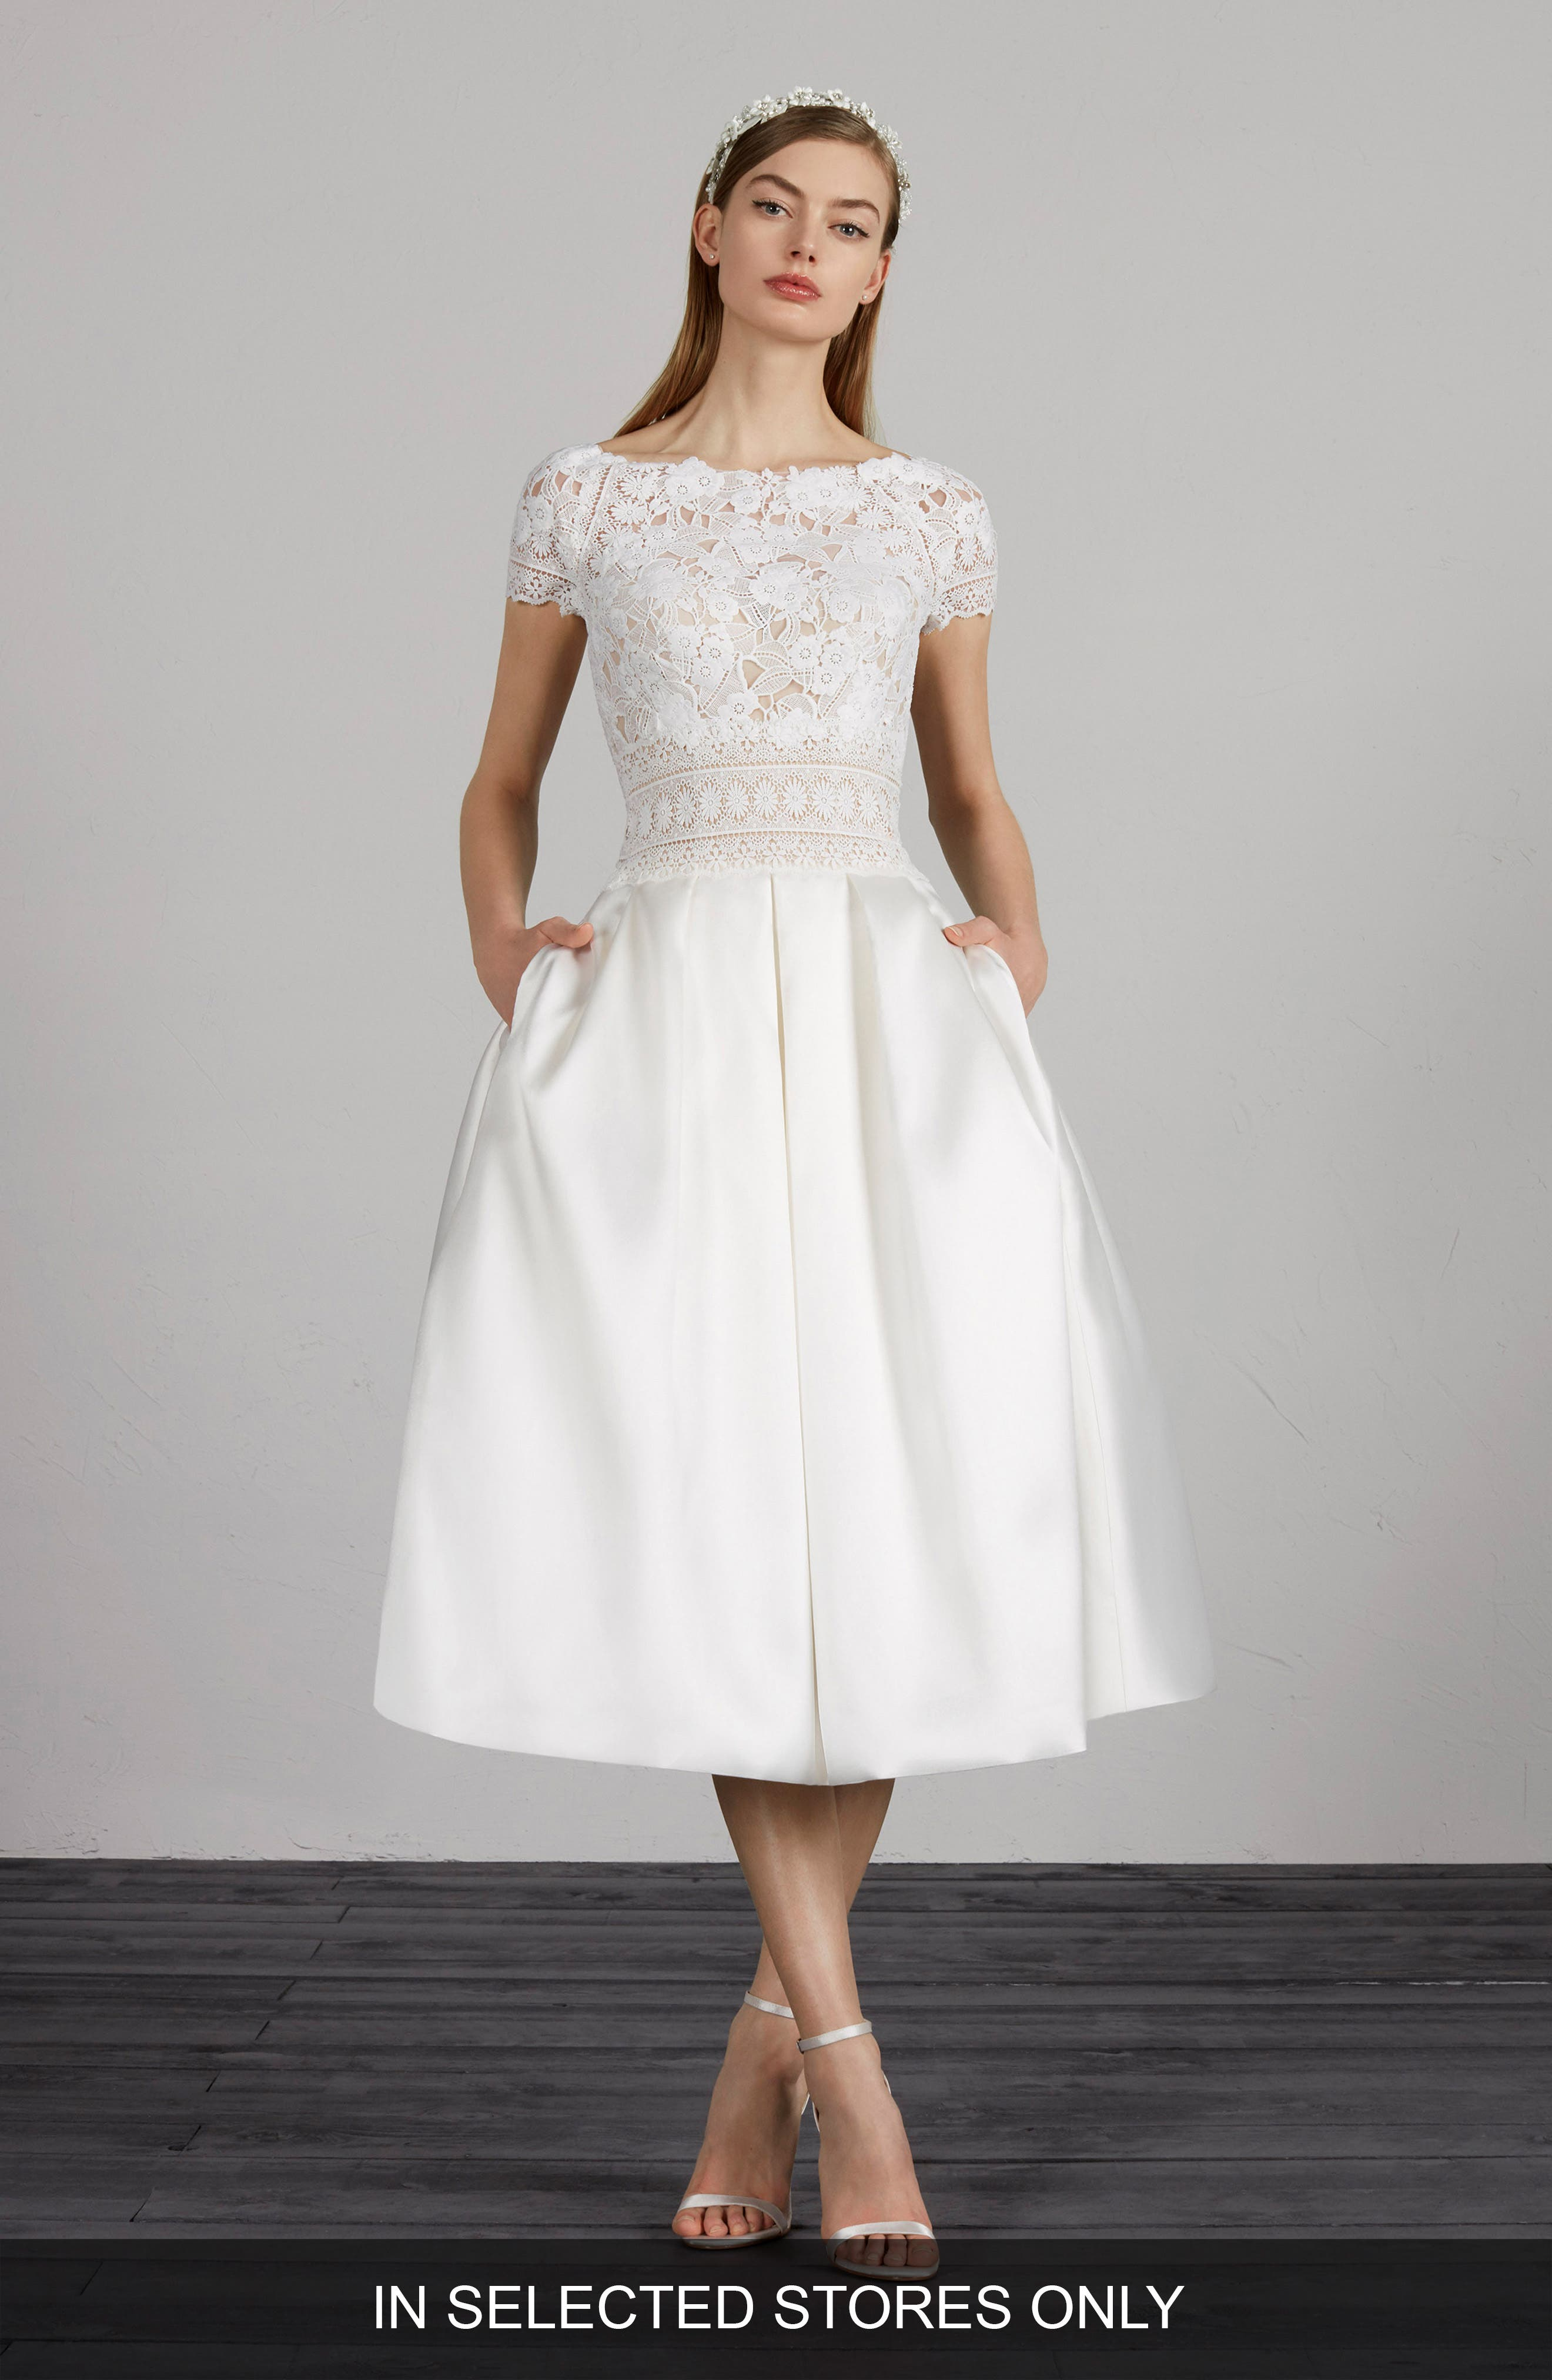 Miami Lace & Mikado Tea Length Dress, Main, color, OFF WHITE/ CRST/ ND